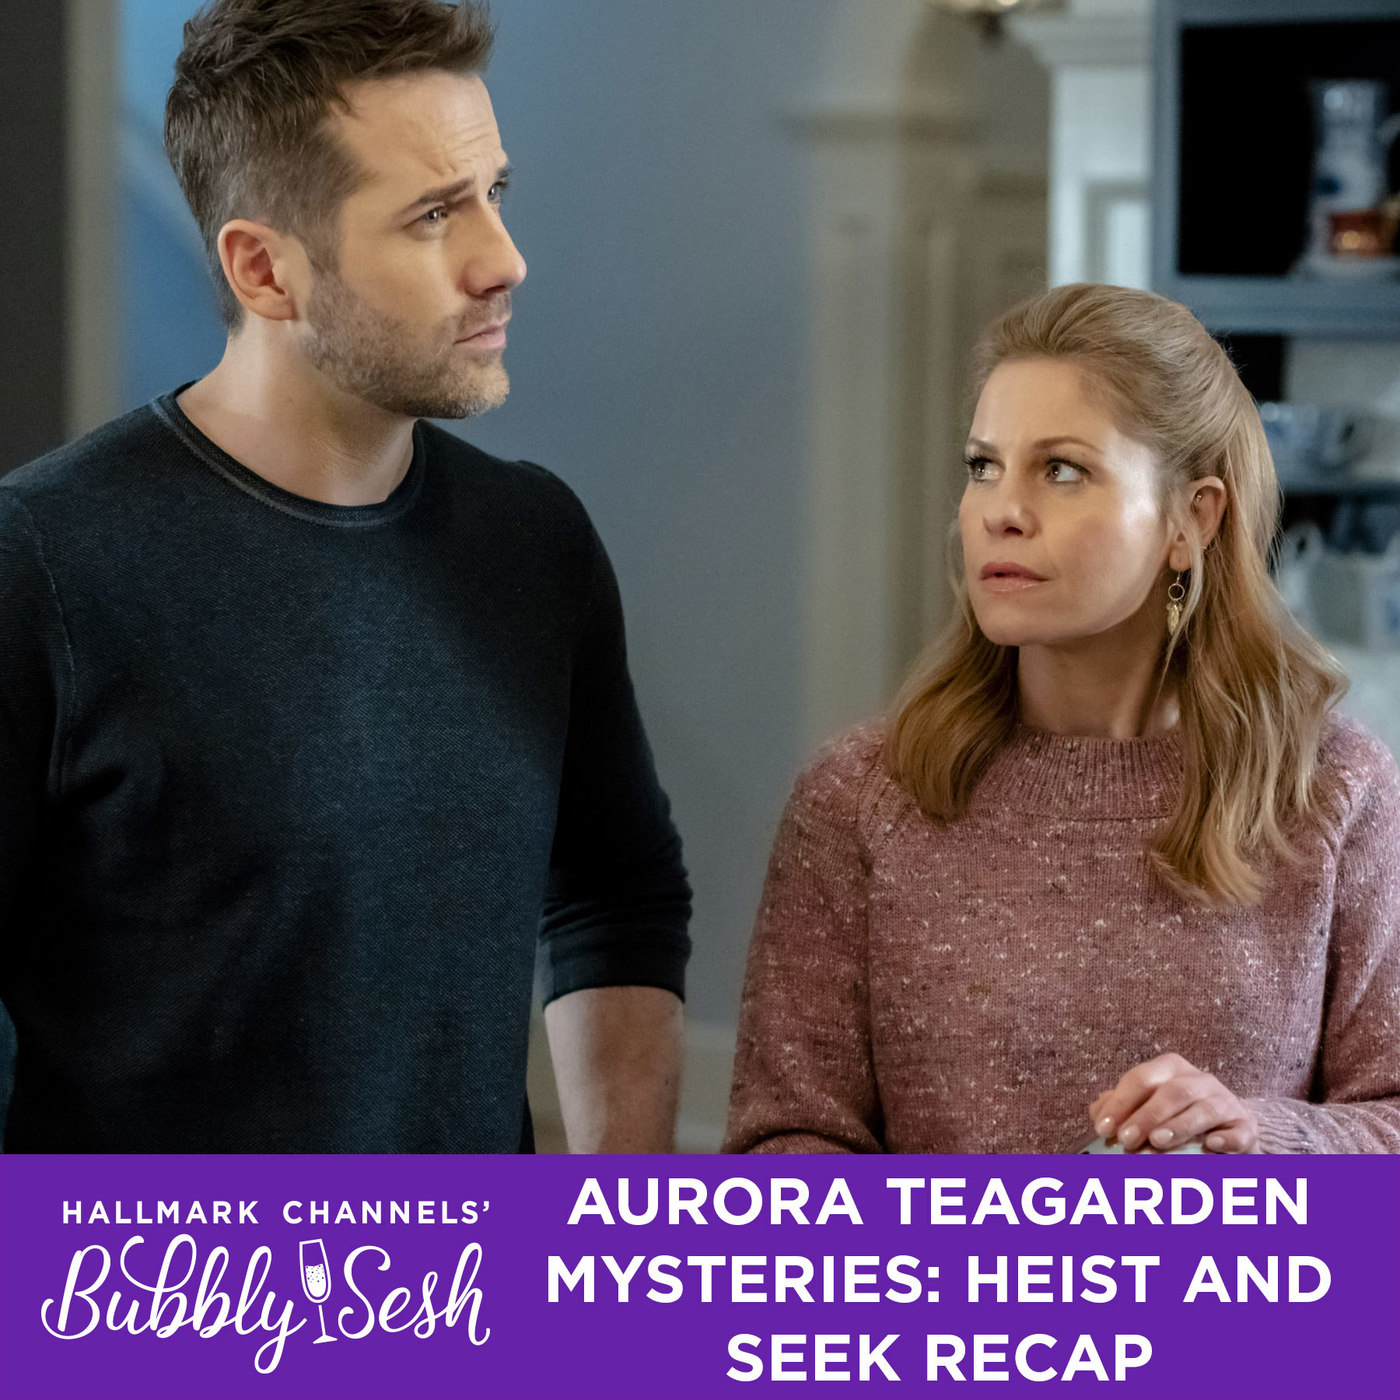 Aurora Teagarden Mysteries: Heist and Seek Recap